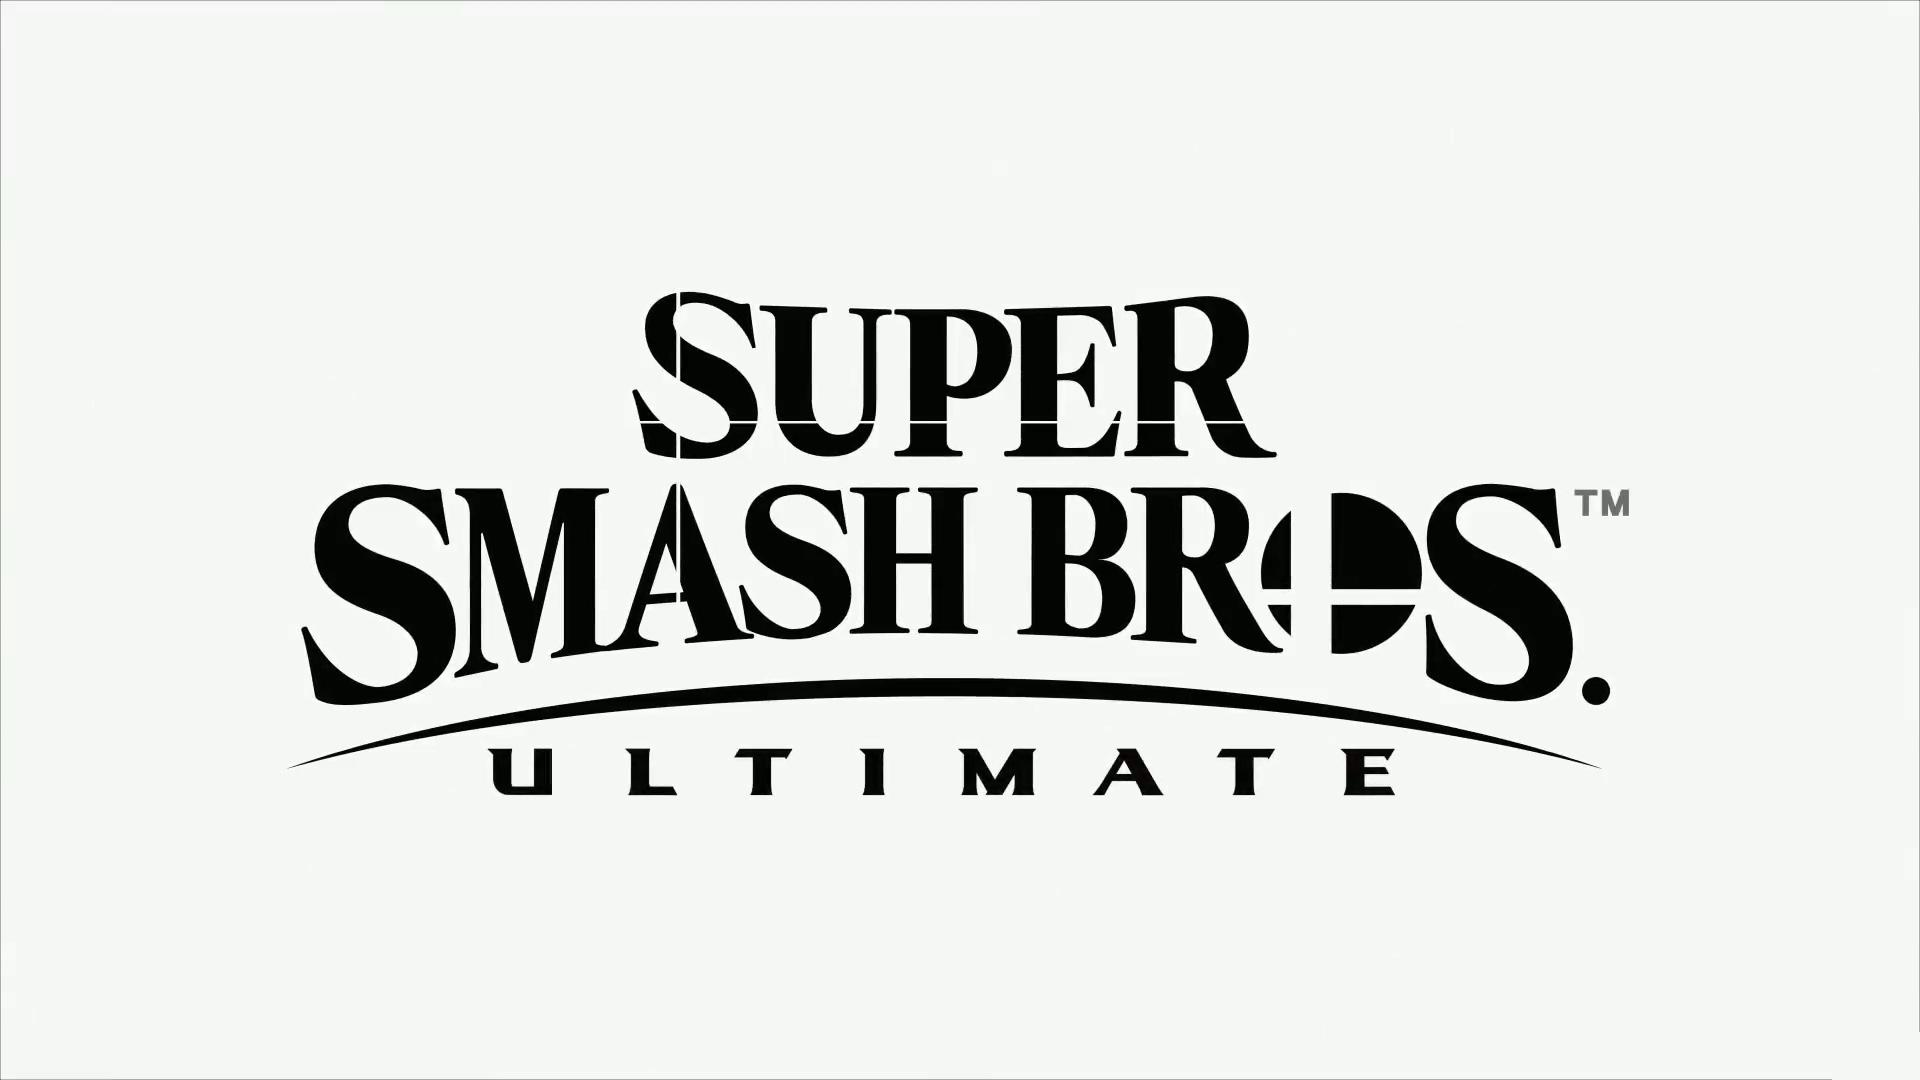 Brace Yourself Super Smash Bros Ultimate Release Date Is December